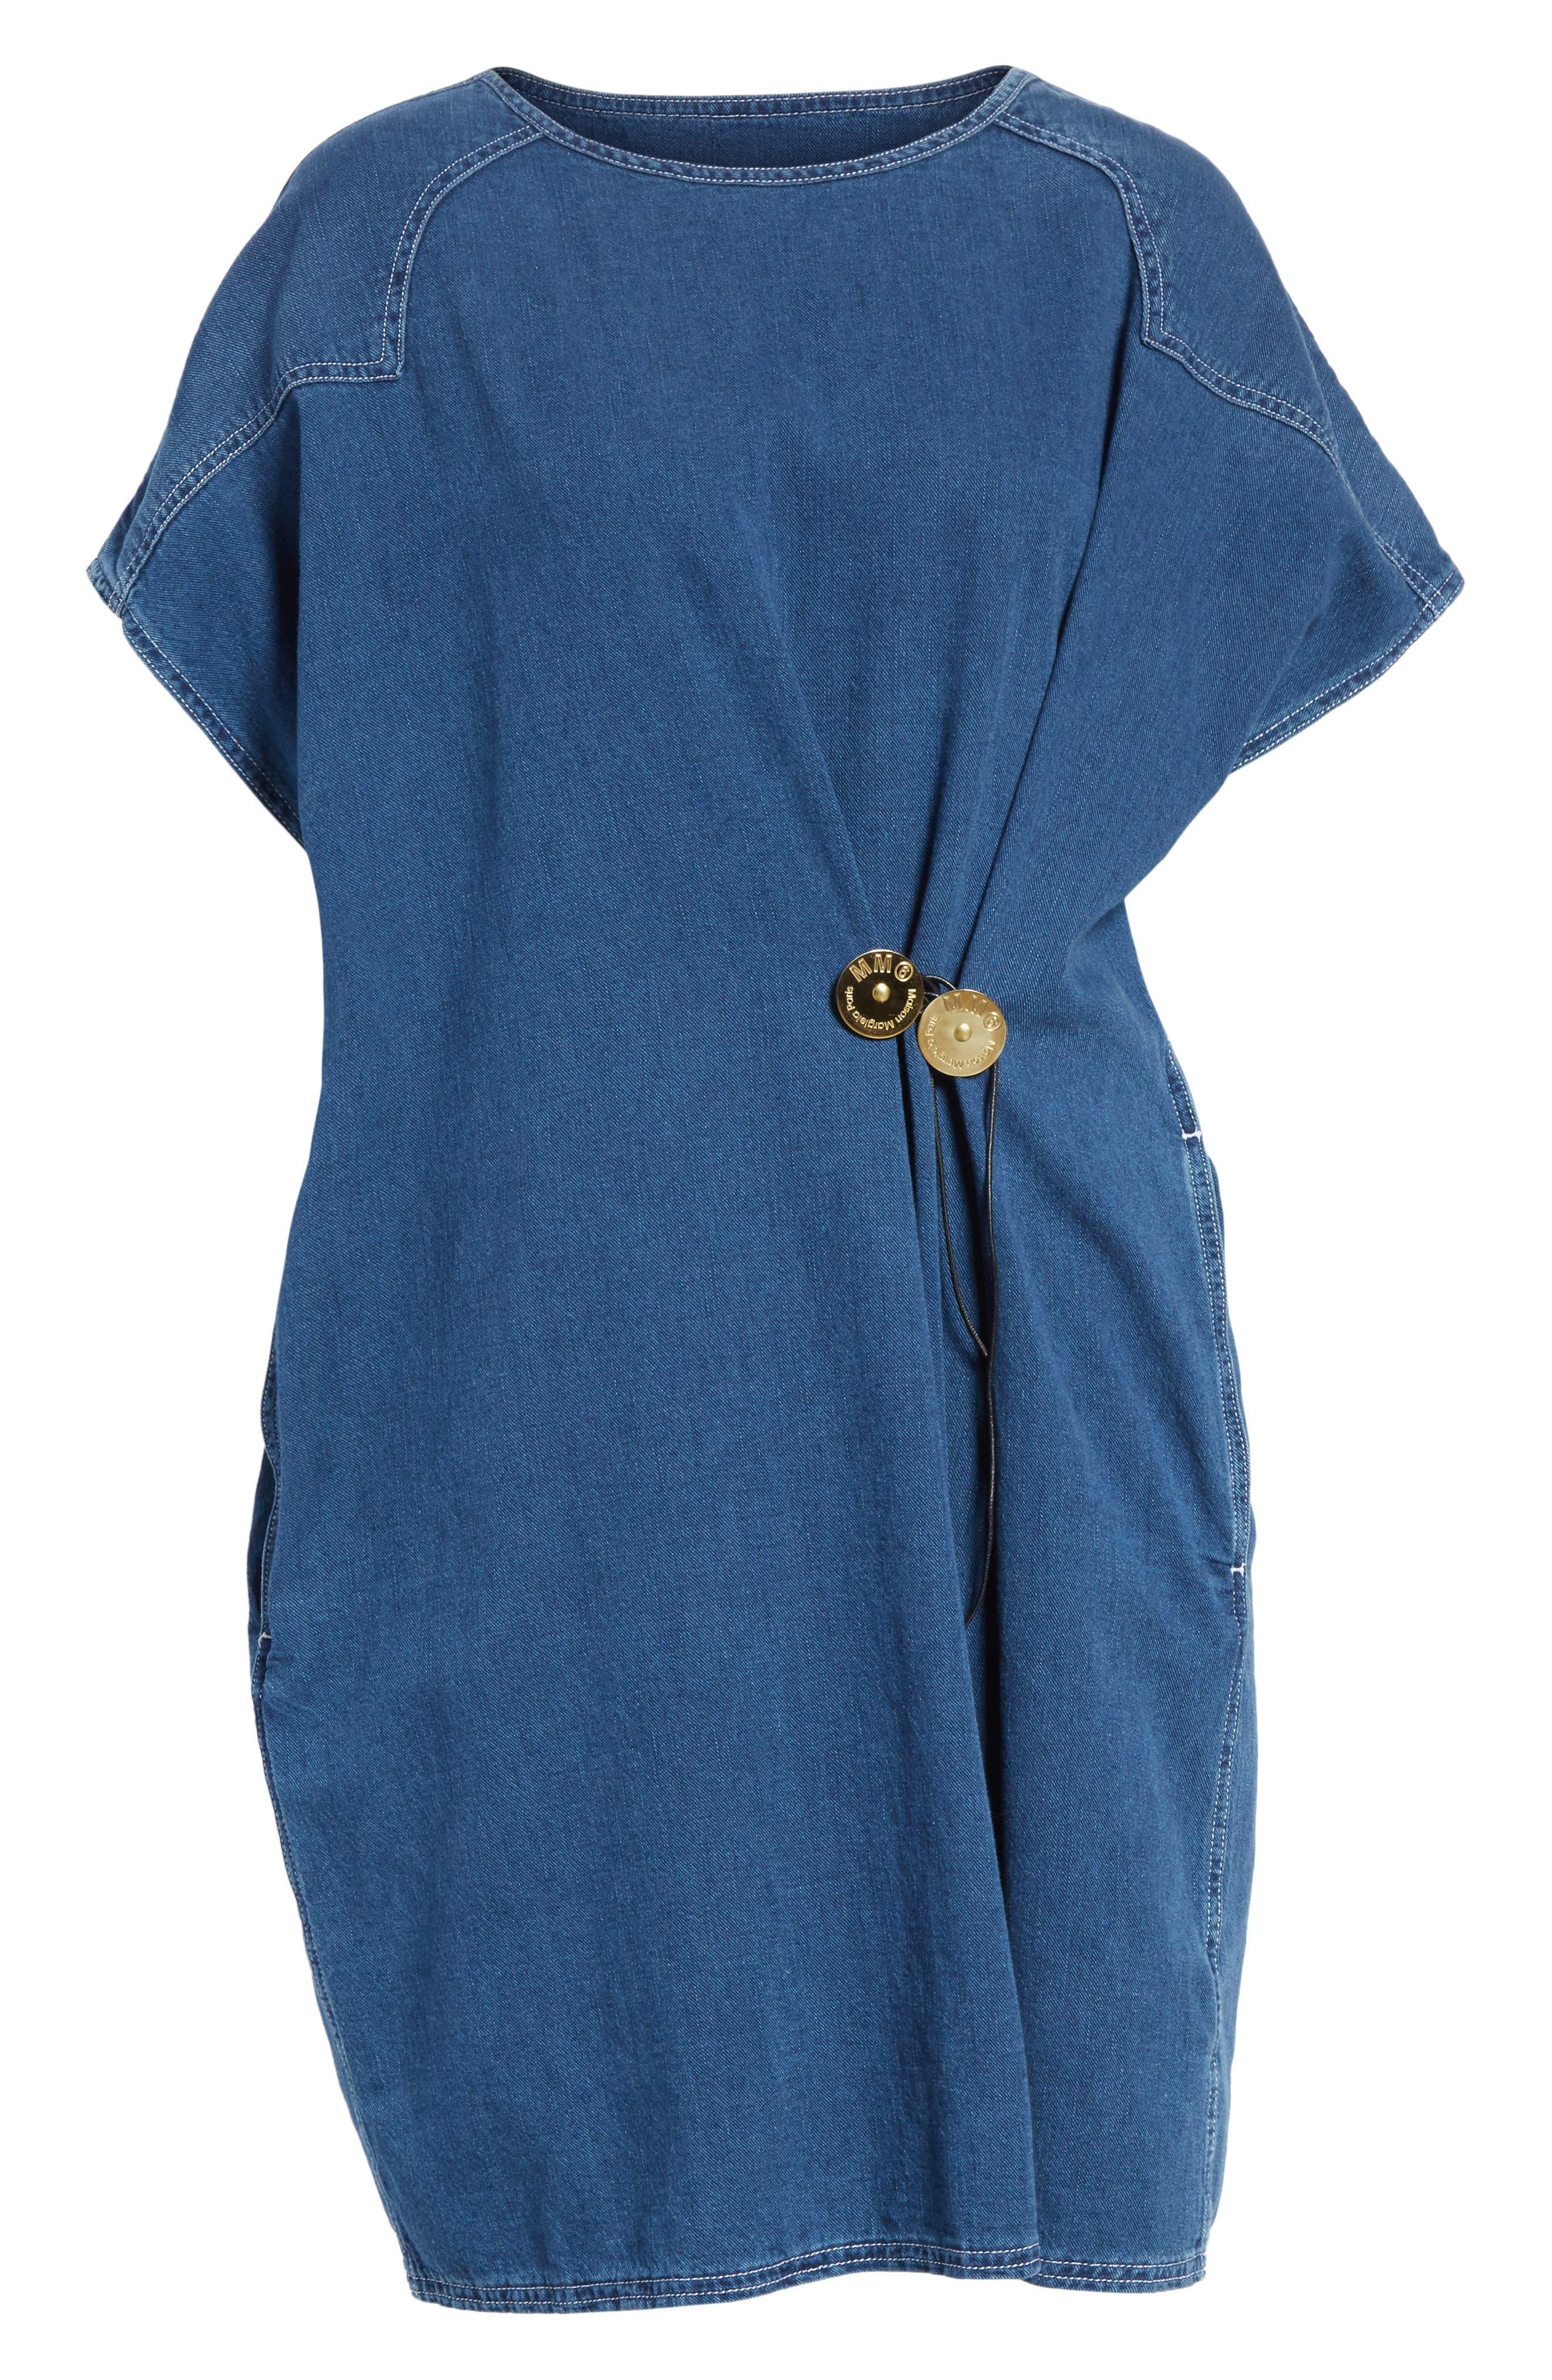 '80s Wash Denim Dress,                             Alternate thumbnail 6, color,                             400